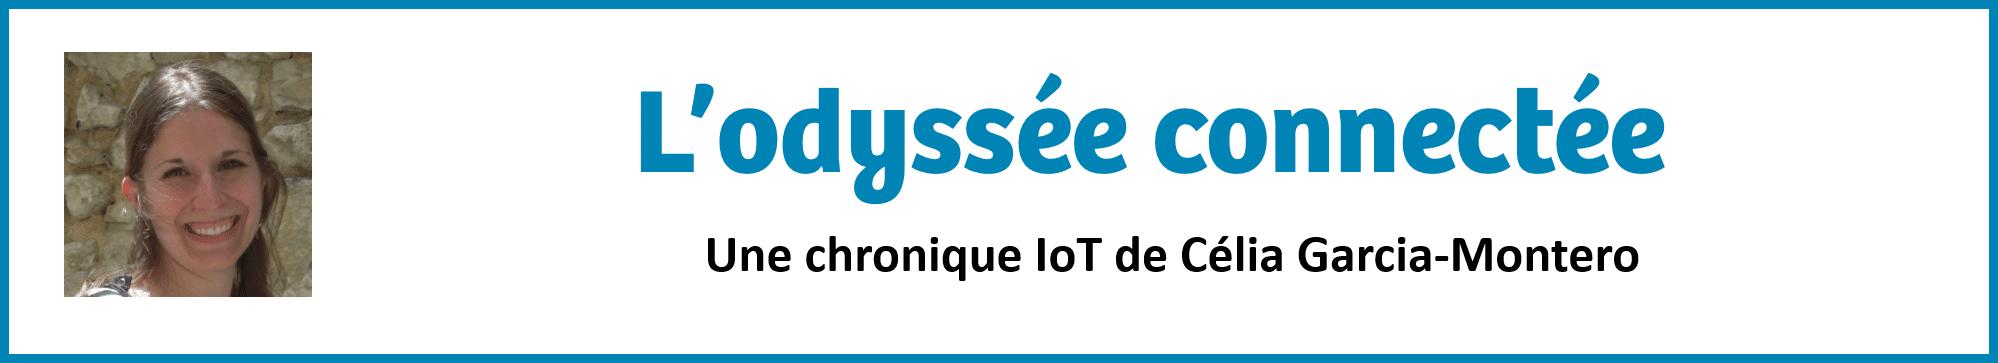 Odyssée connectée - IOT